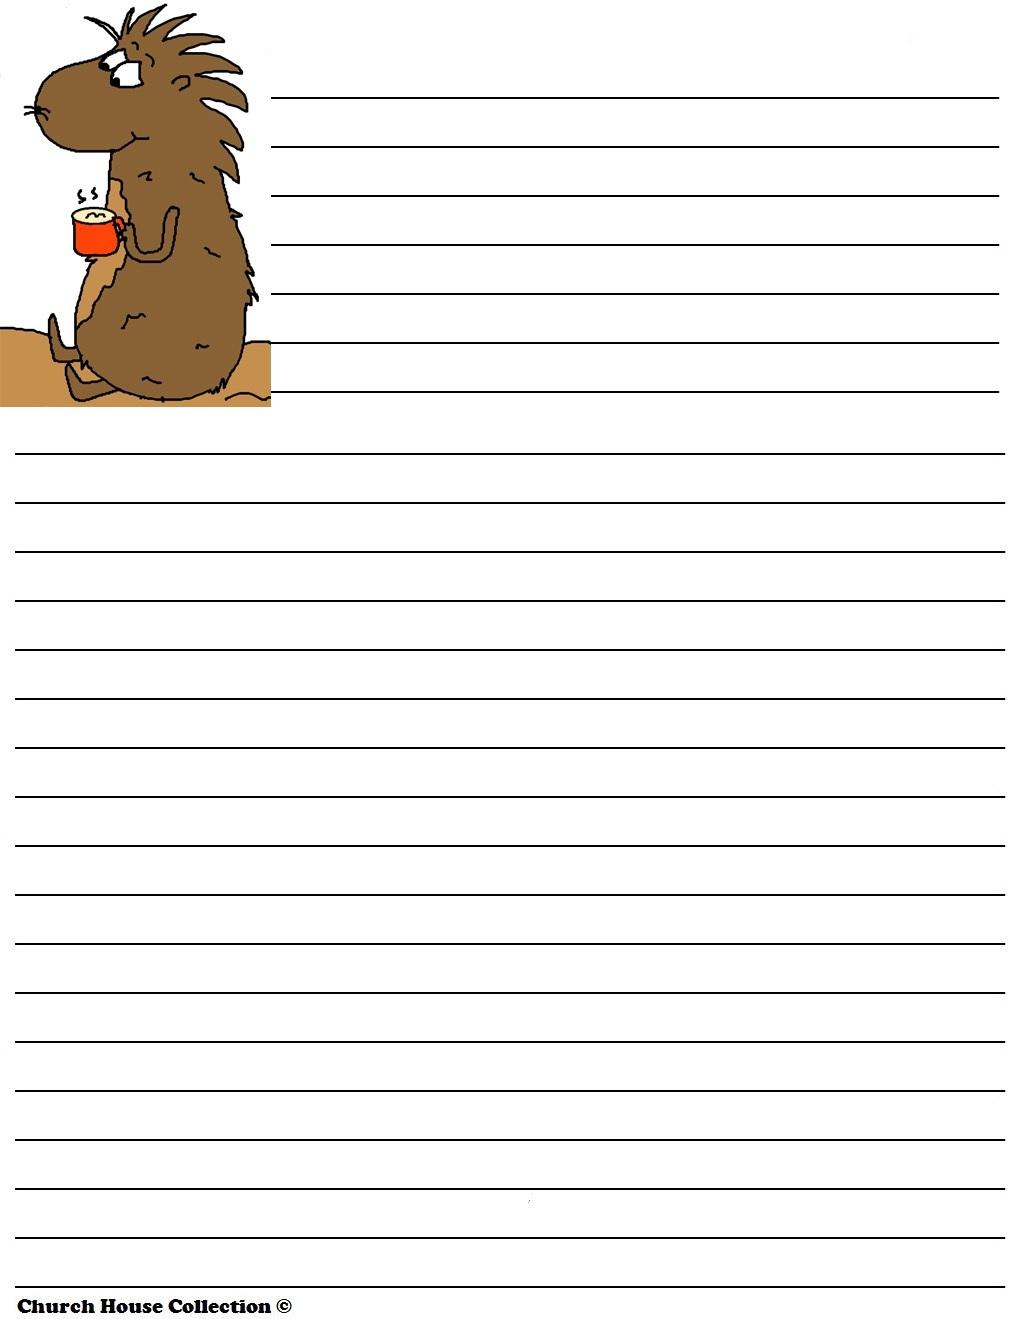 groundhog day essay english unite groundhog day archives english  essay about groundhog day research paper writing service essay about groundhog day